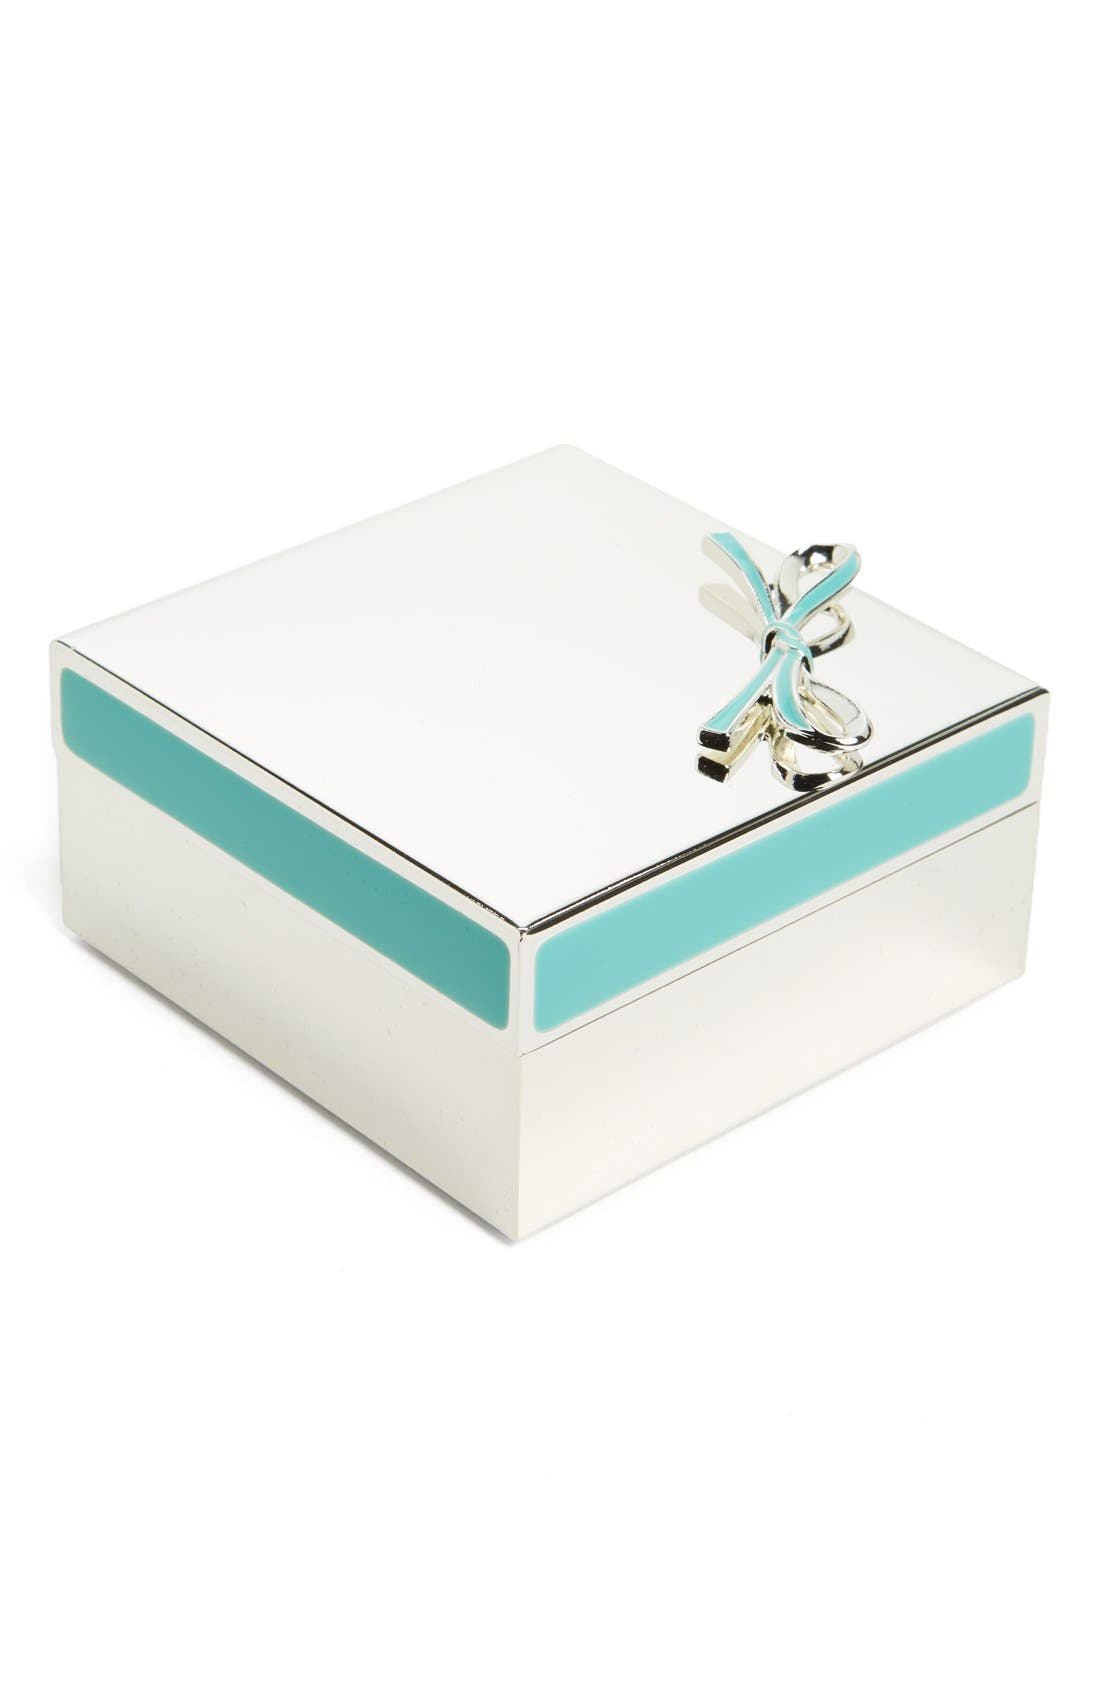 'vienna lane' keepsake box,                             Main thumbnail 1, color,                             400